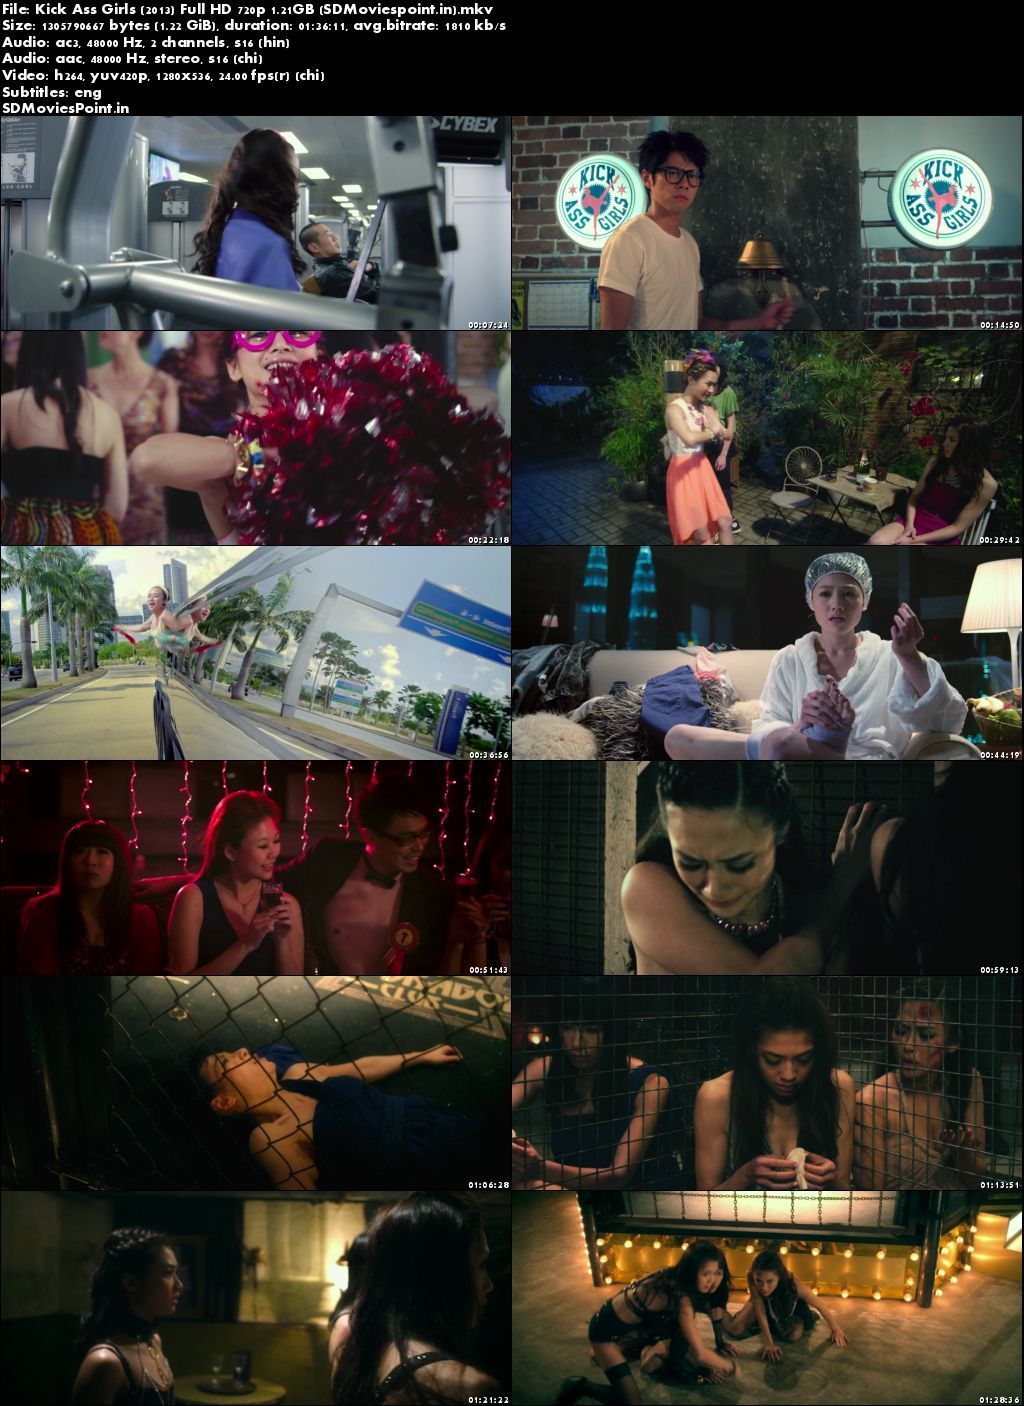 Screen Shot Kick Ass Girls (2013) Full HD Movie Download Dual Audio Hindi Dubbed